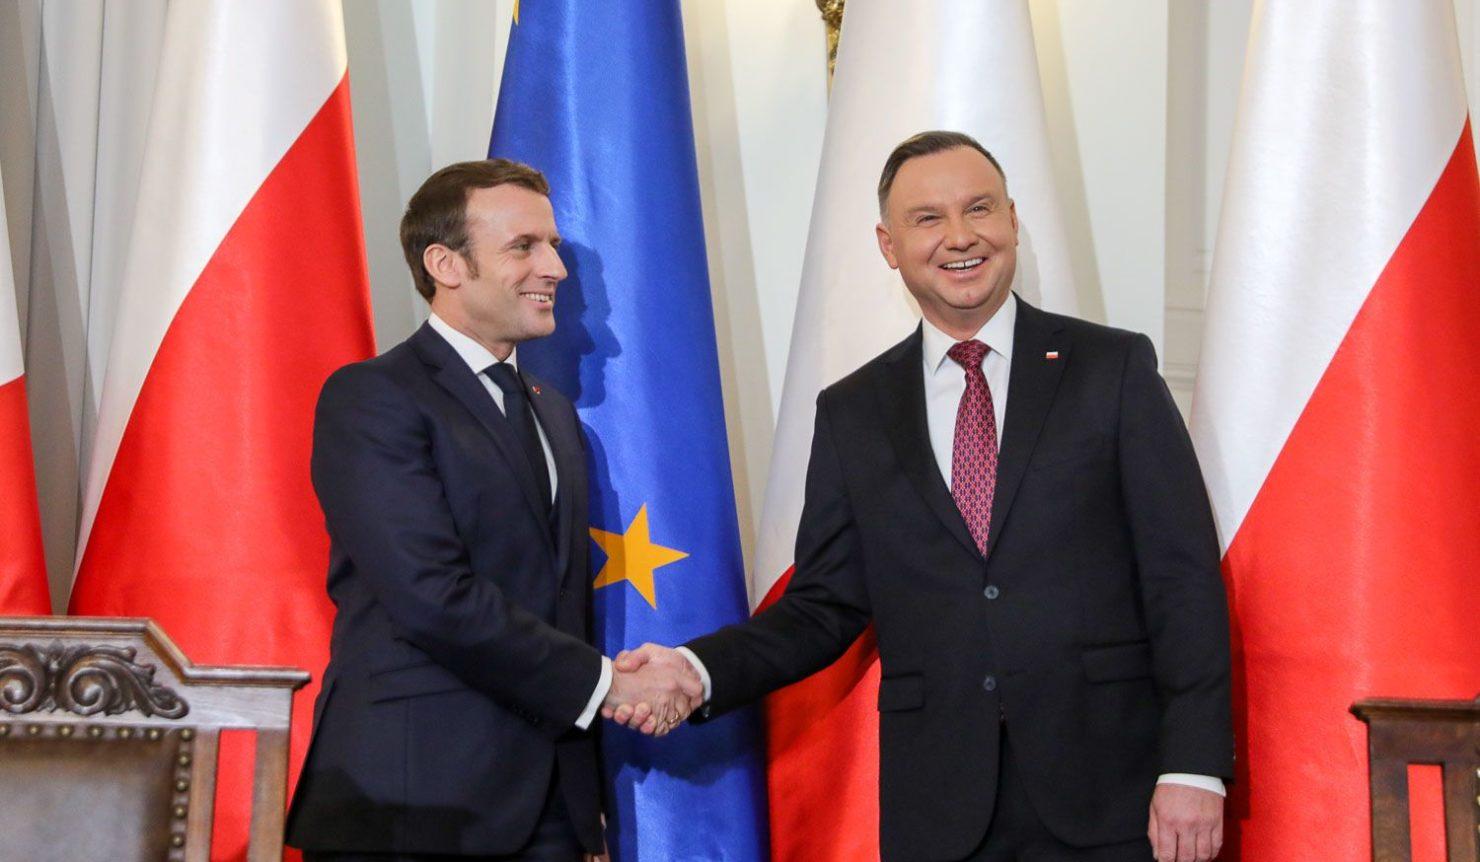 Emmanuel Macron et Andrzej Duda.